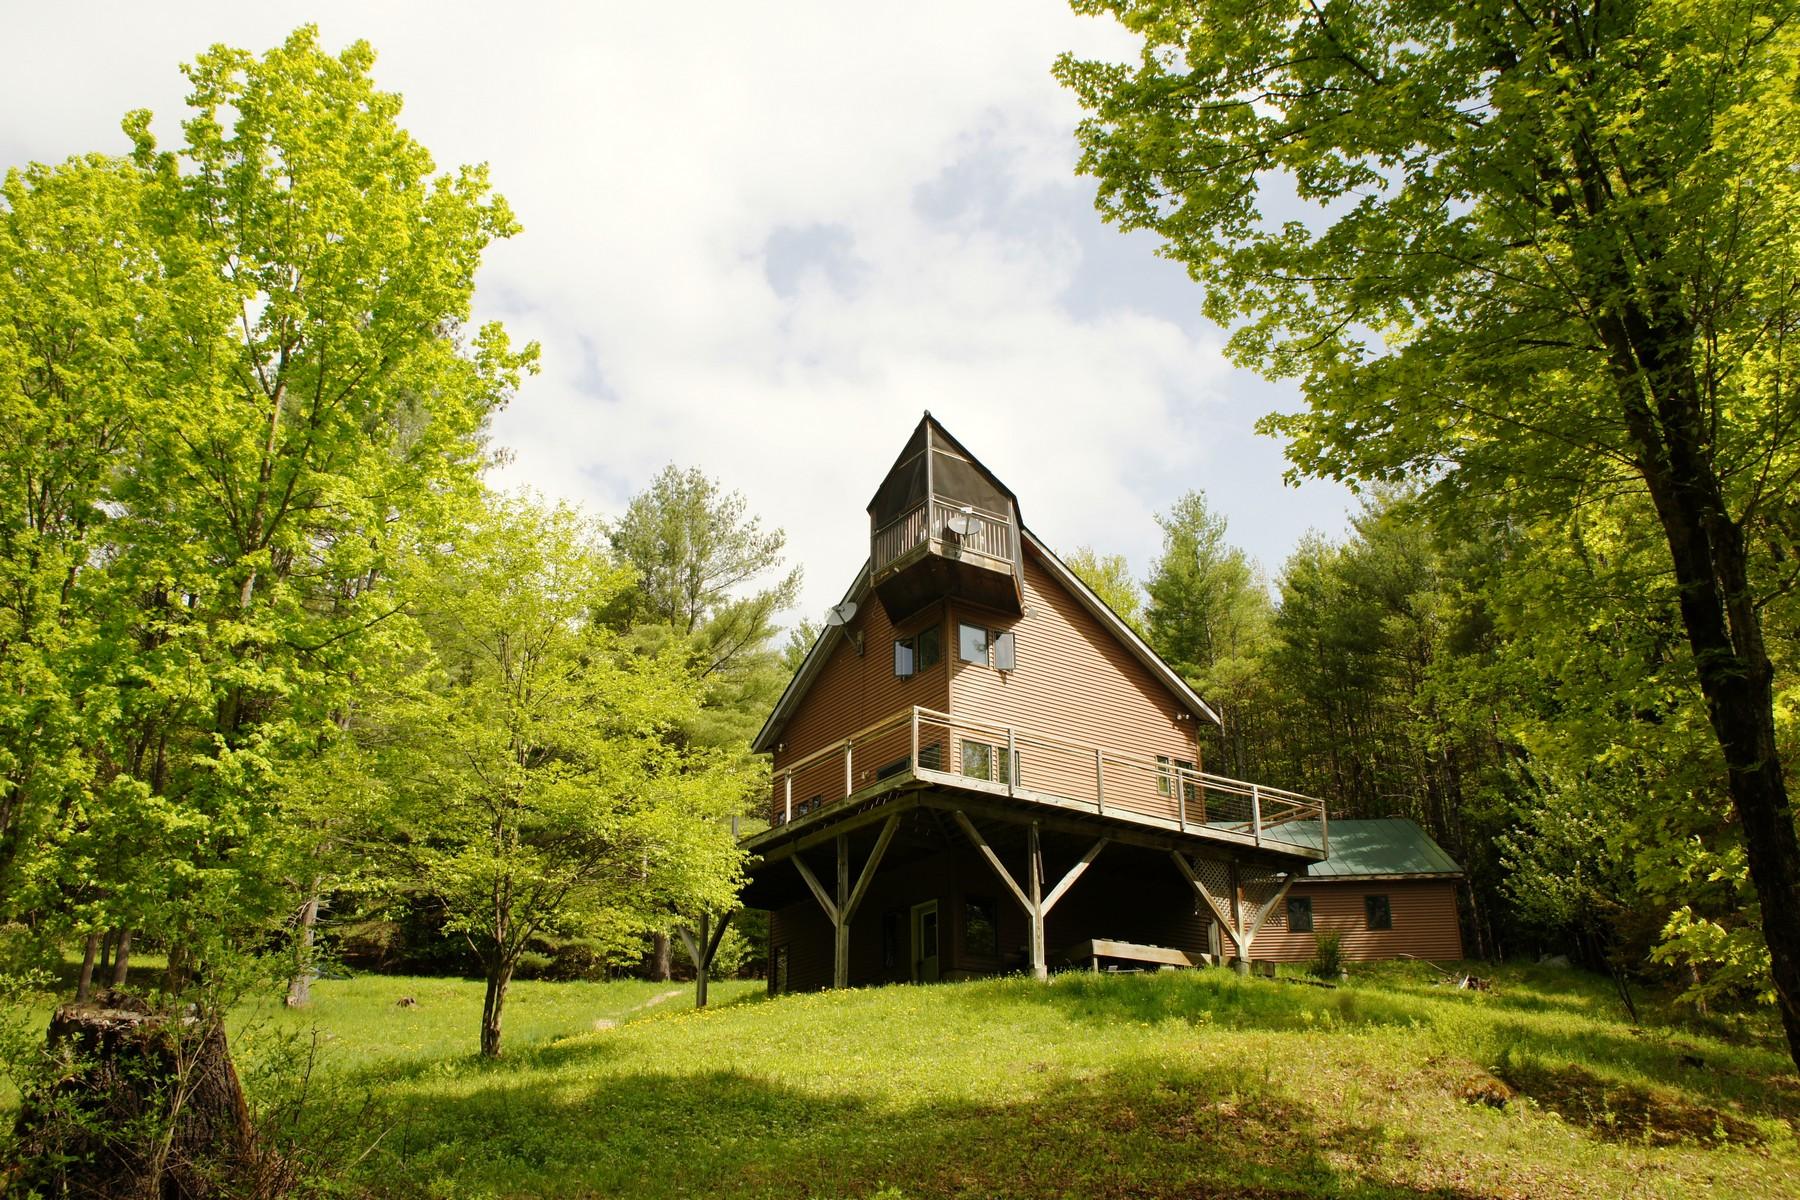 Villa per Vendita alle ore 412 Adamant Rd, Calais Calais, Vermont 05640 Stati Uniti